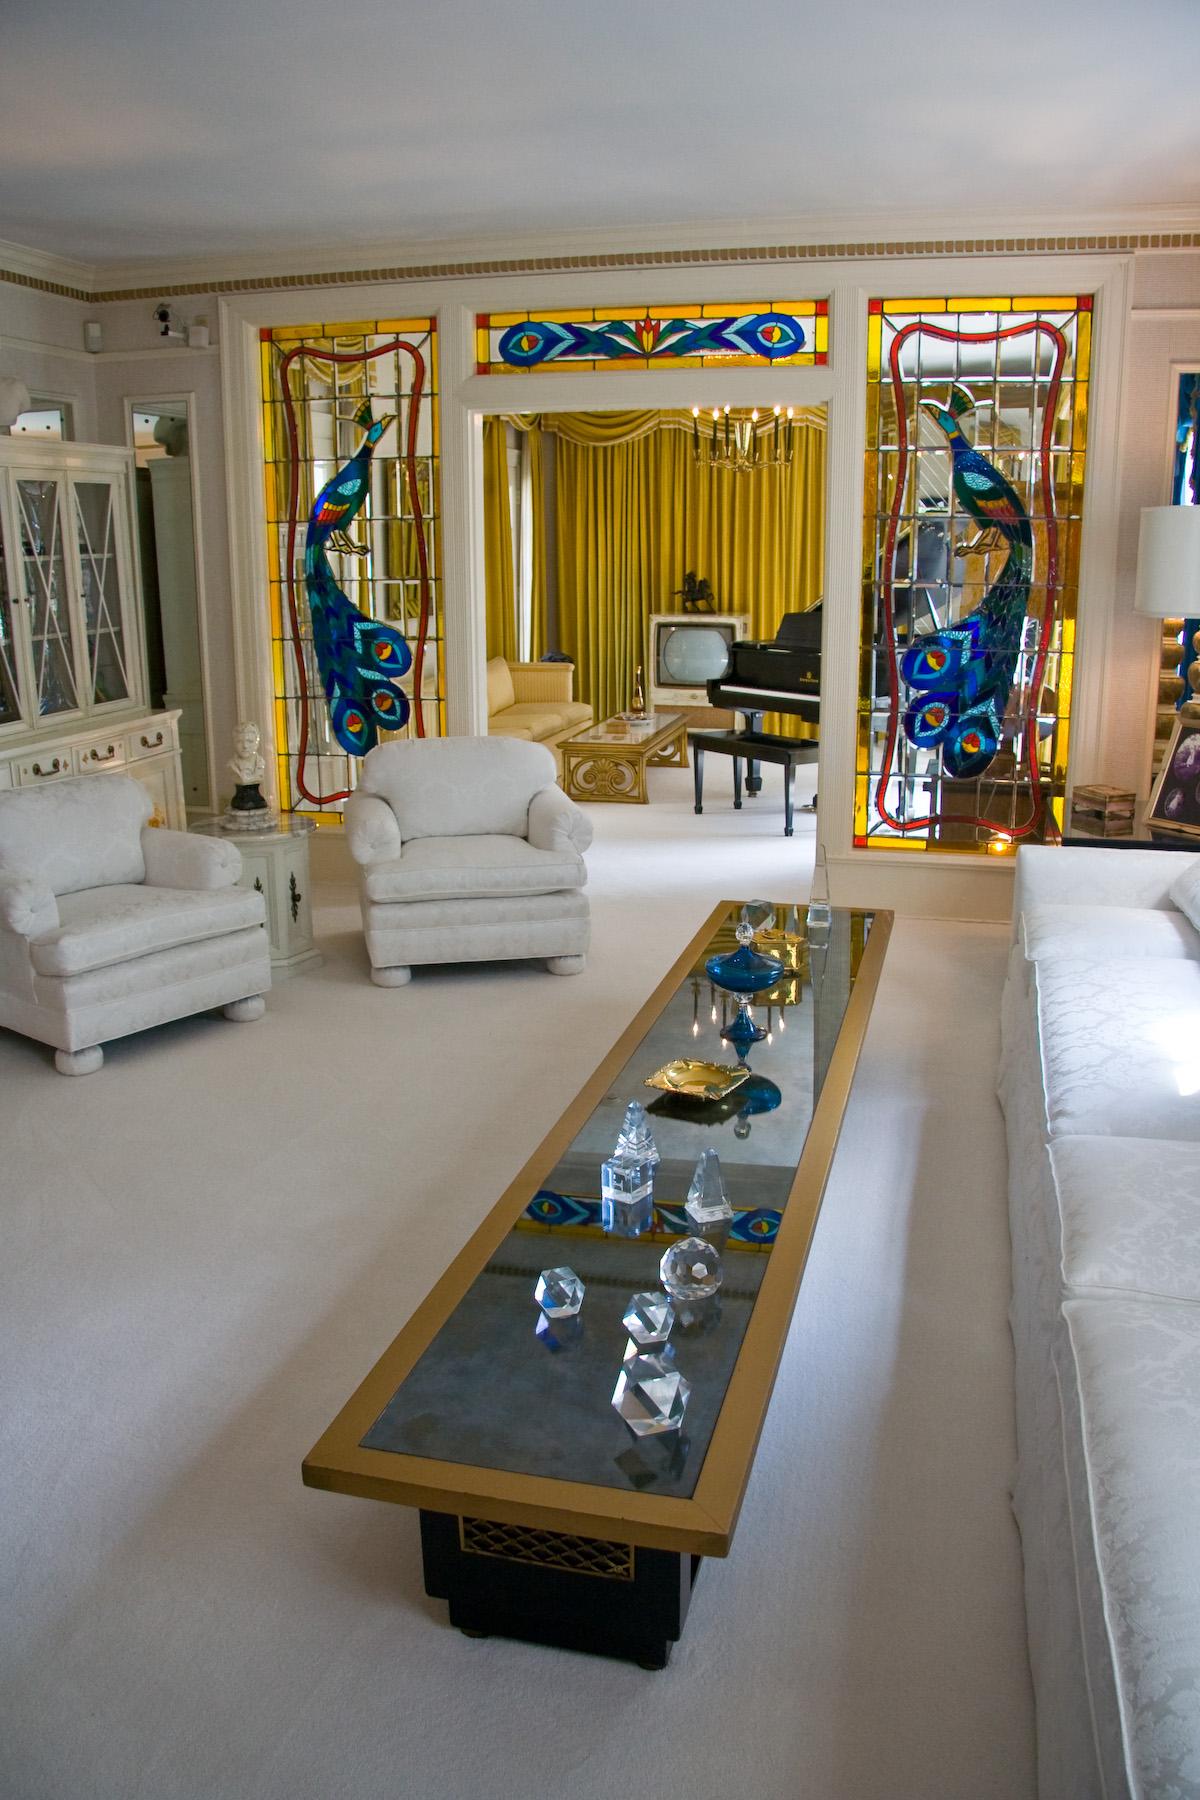 Graceland Upstairs Bathroom http://jaydeanhcr.wordpress.com/2011/08/16 ...